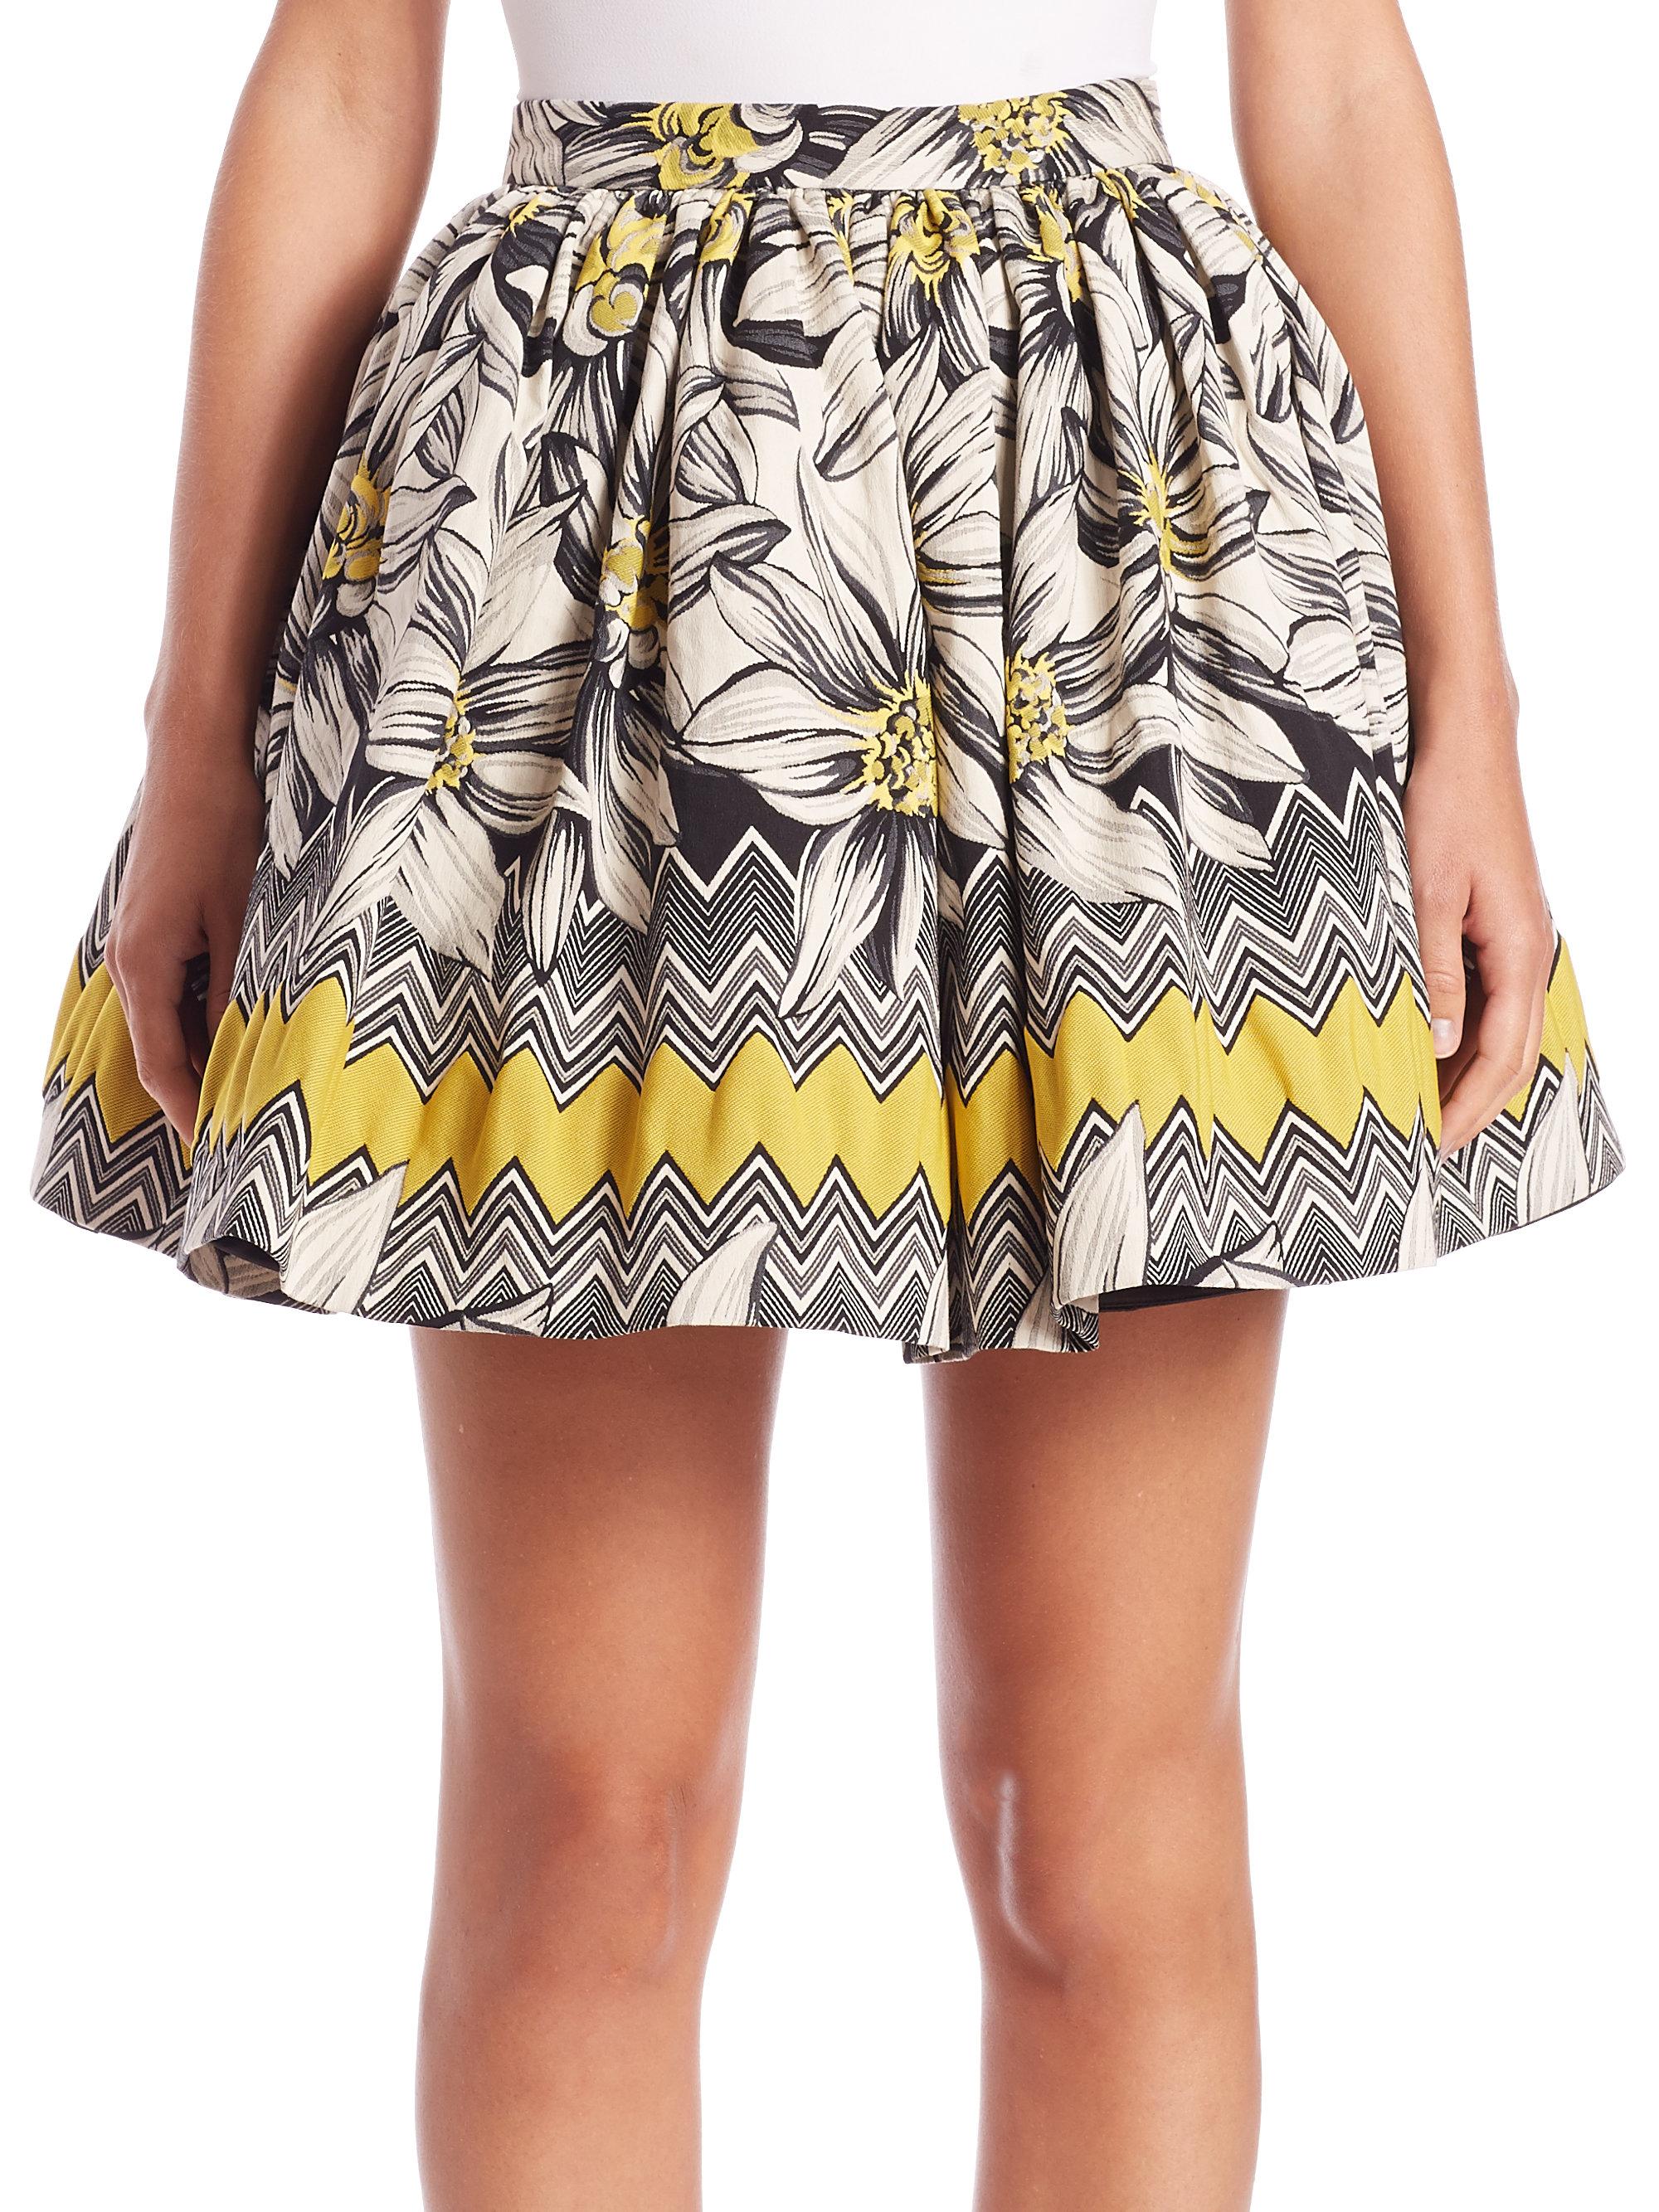 ea6b0246232cf7 Alice + Olivia Tania Full Pouf Skirt in Black - Lyst